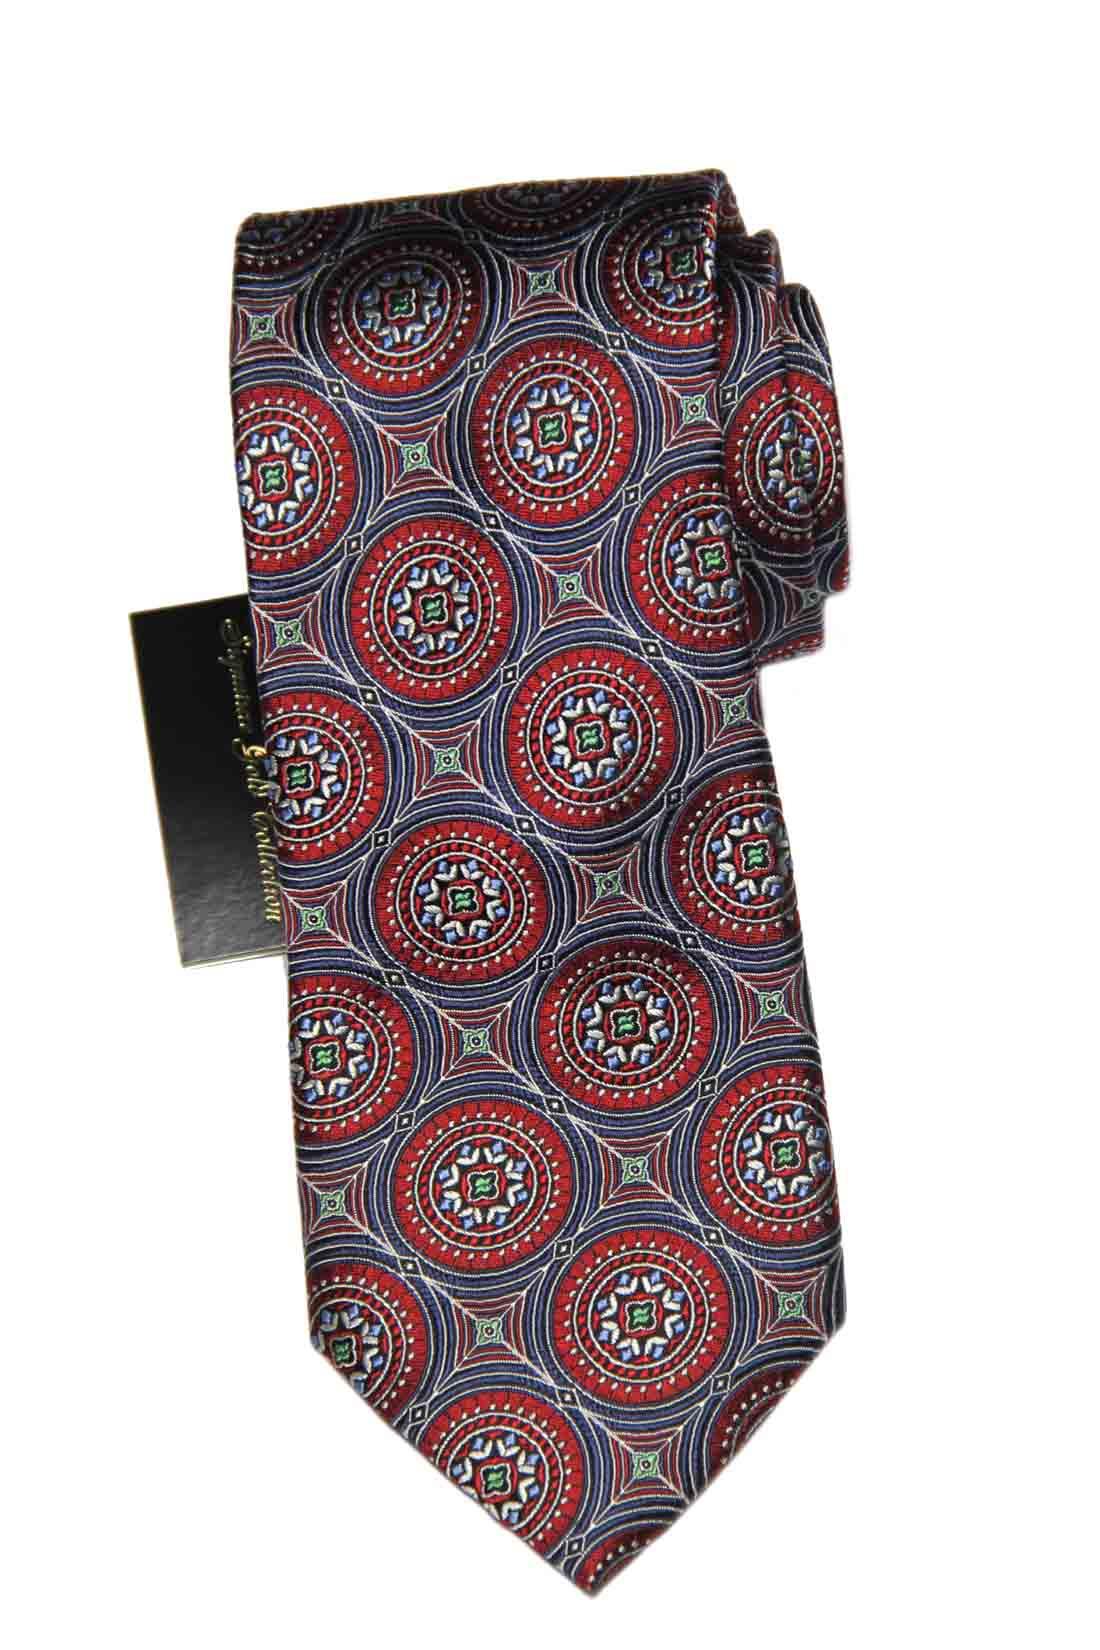 Jos A Bank Tie Silk Red Gray Geometric Men's